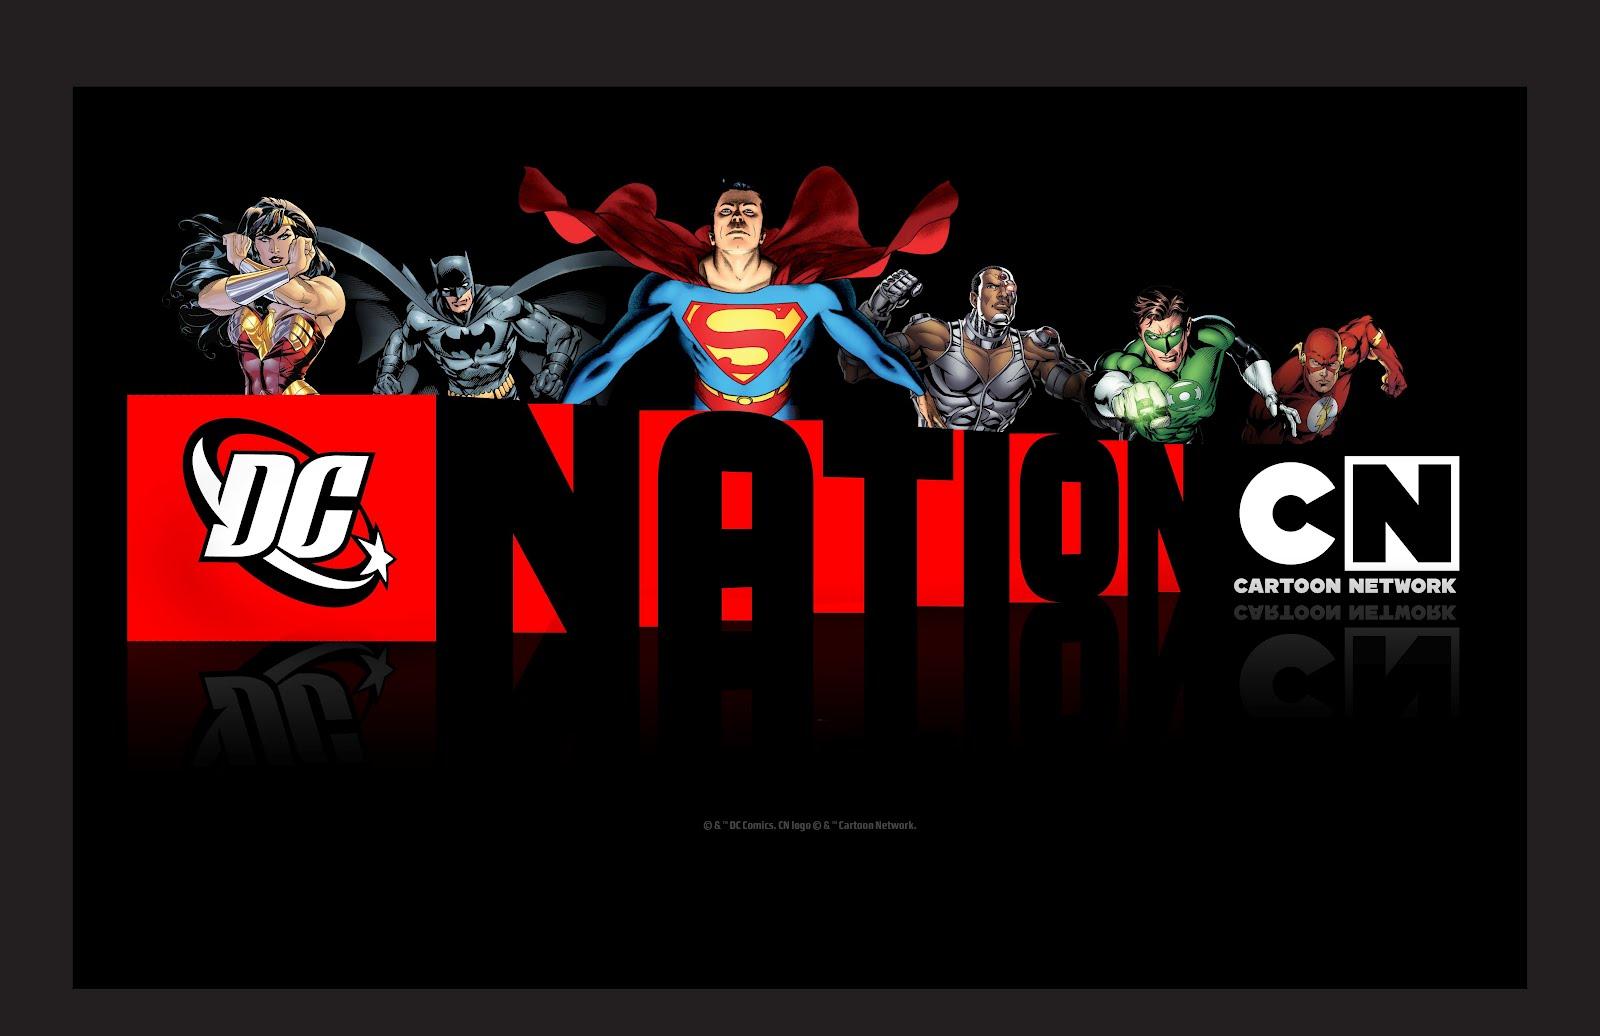 http://3.bp.blogspot.com/-phQ0AWgIC10/TzyH2hkGPiI/AAAAAAAADKo/tOmFW2UNVPI/s1600/DC_Nation_Logos_Page_2_20110323171654.jpg